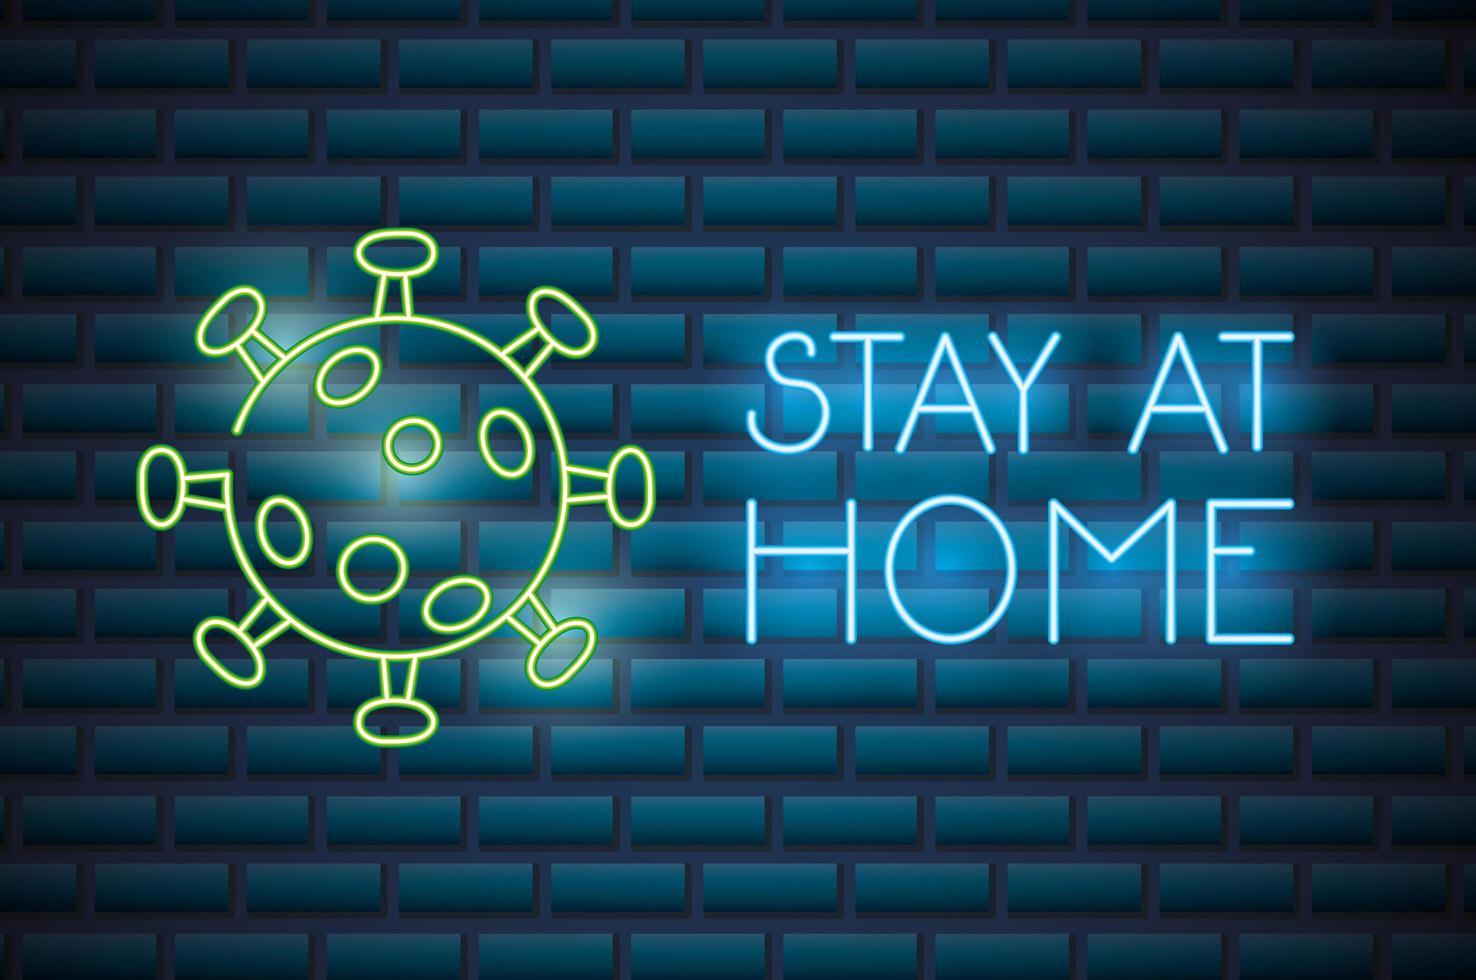 blijf thuis, coronavirus neonreclame vector